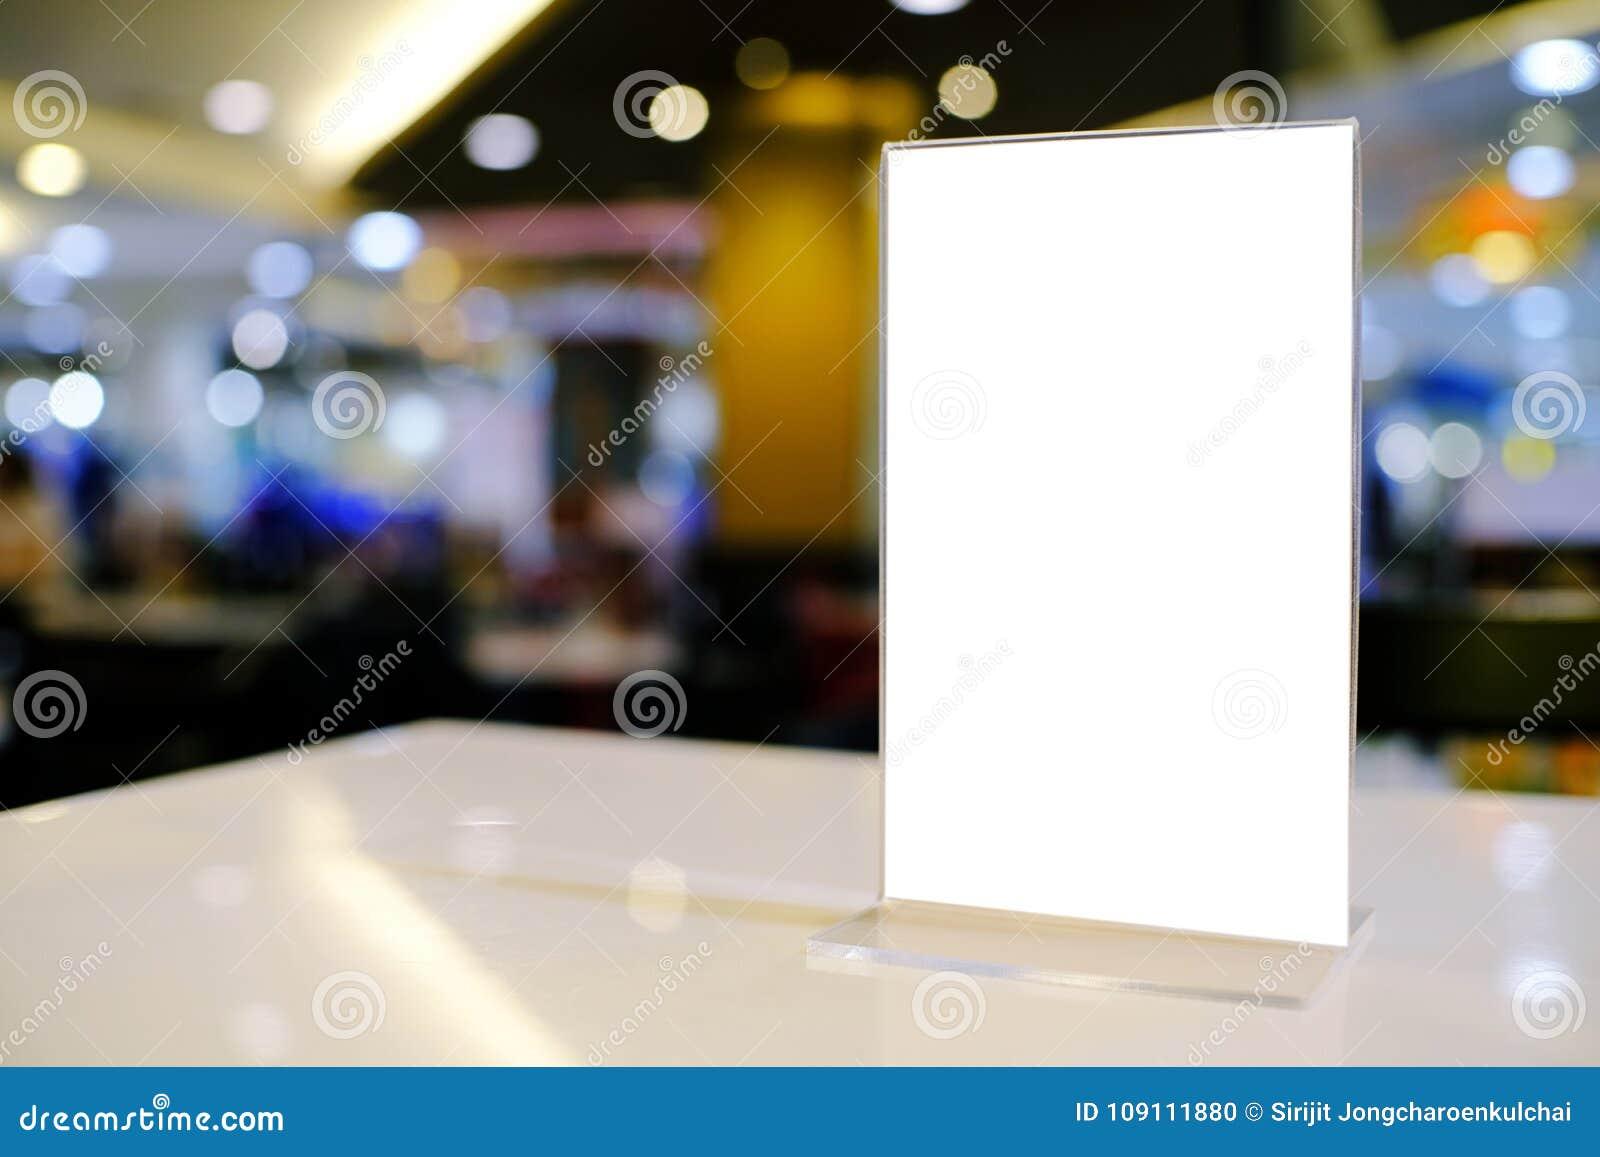 Mock Up Menu Frame Standing On Wood Table In Bar Restaurant Cafe - Restaurant table advertising